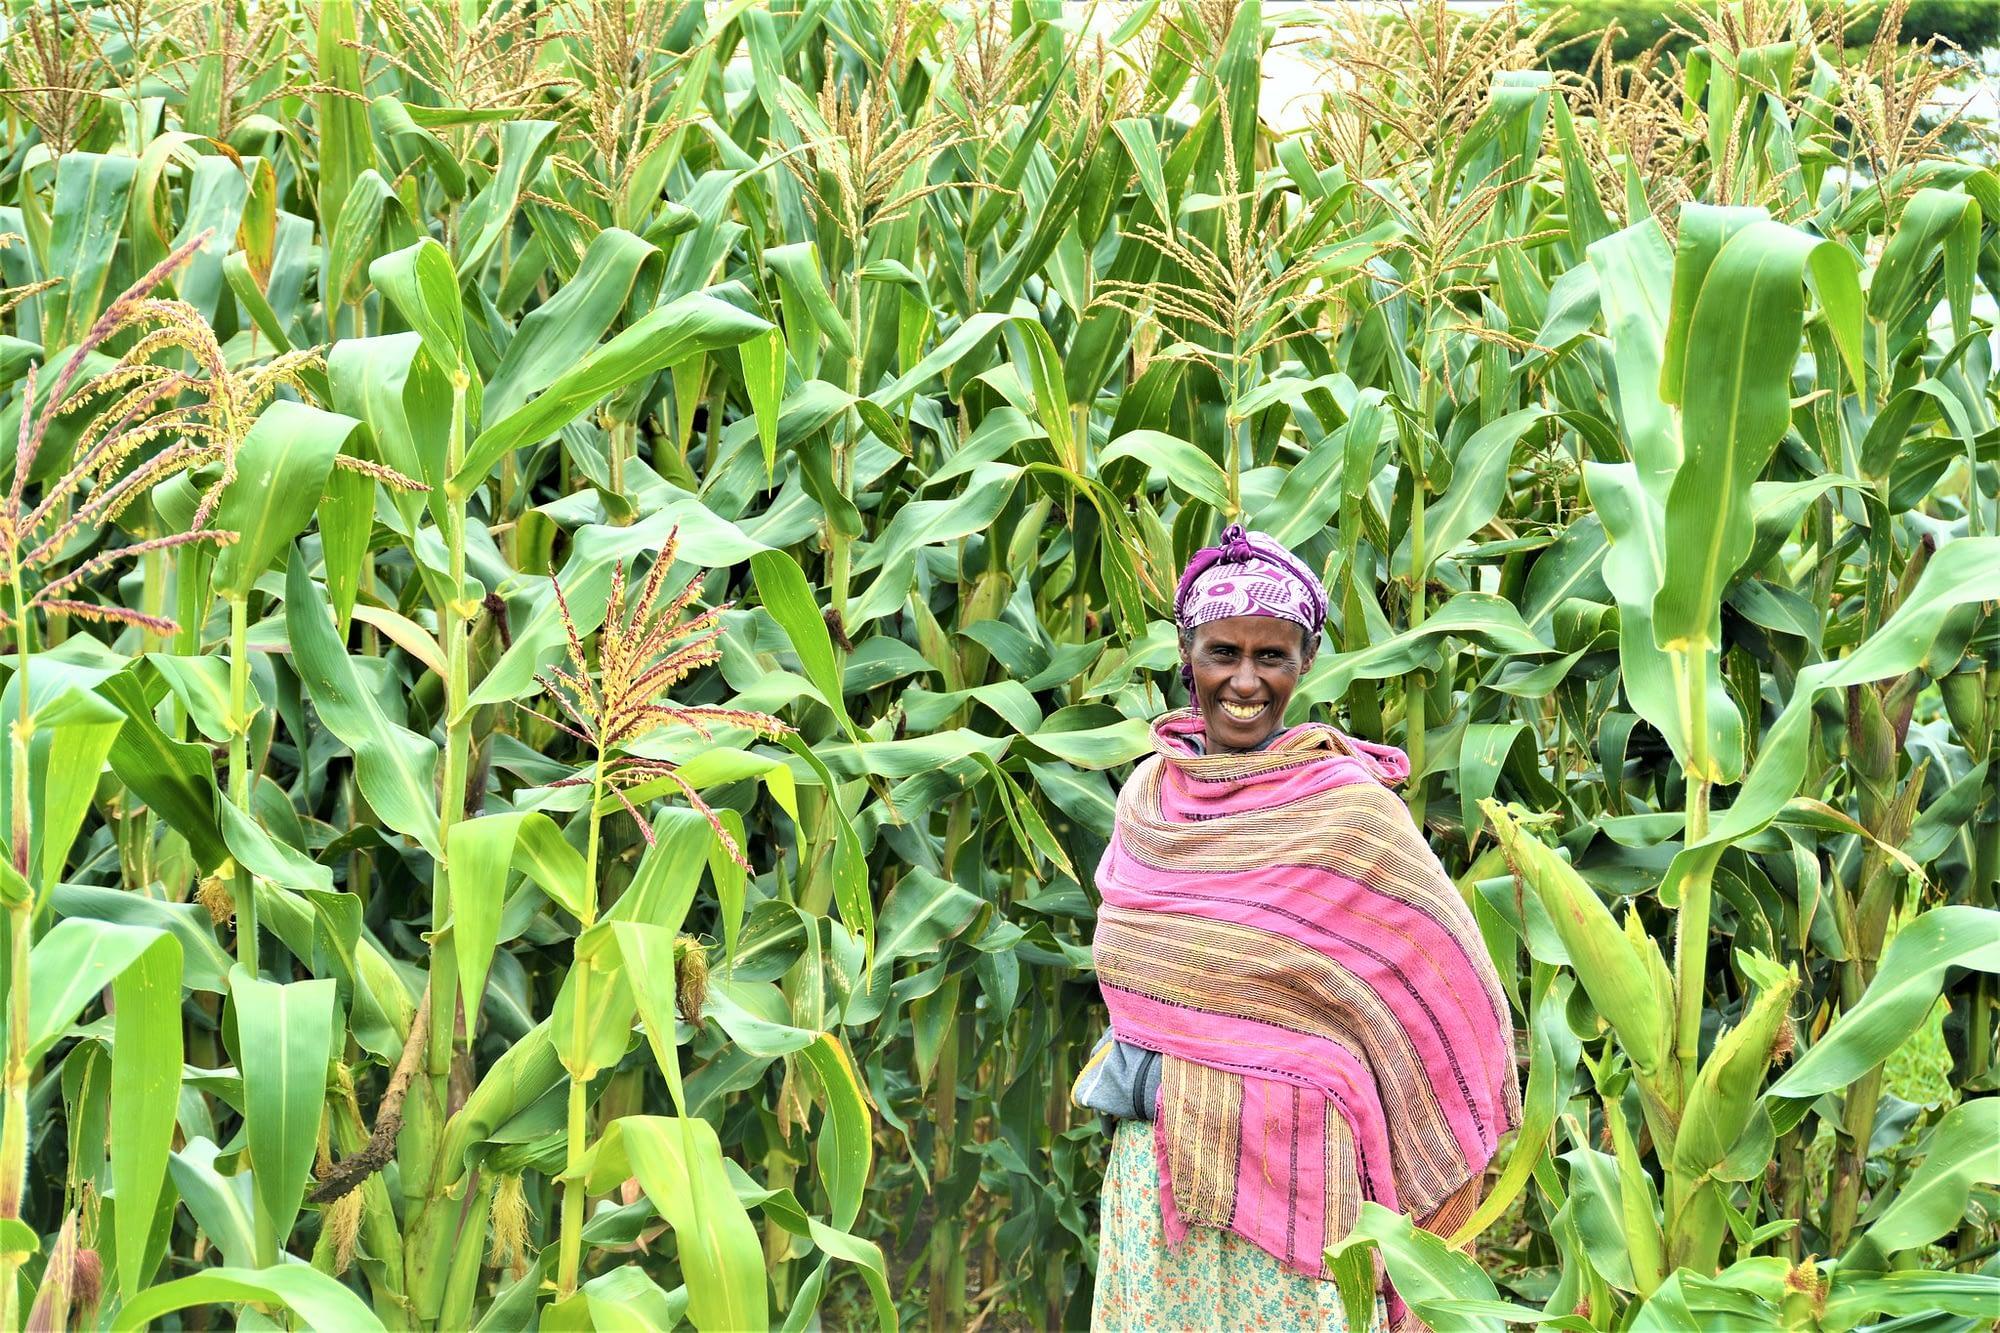 A maize farmer in southern Ethiopia. (Photo: S. Samuel/CCAFS)